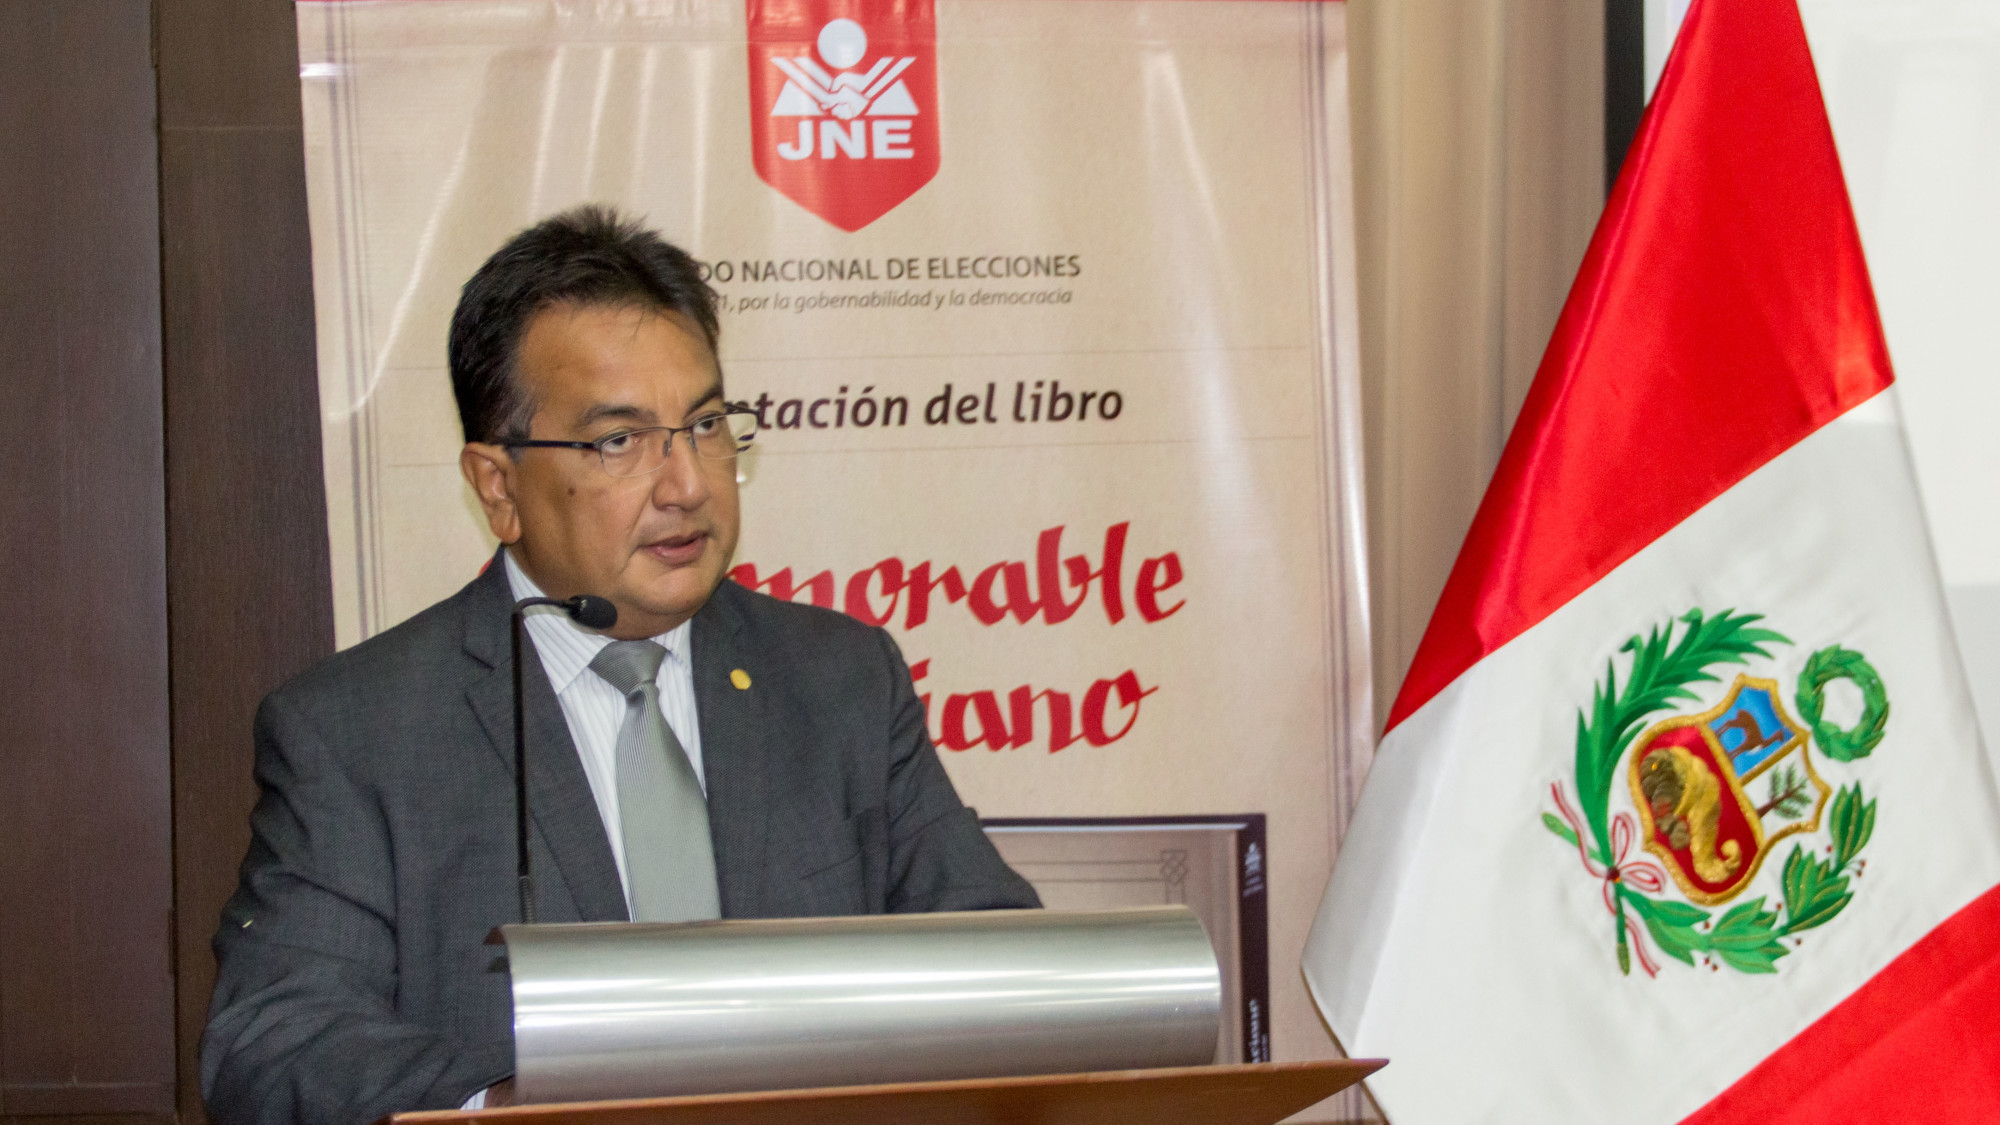 Presidente JNE entrega libros a UDEP